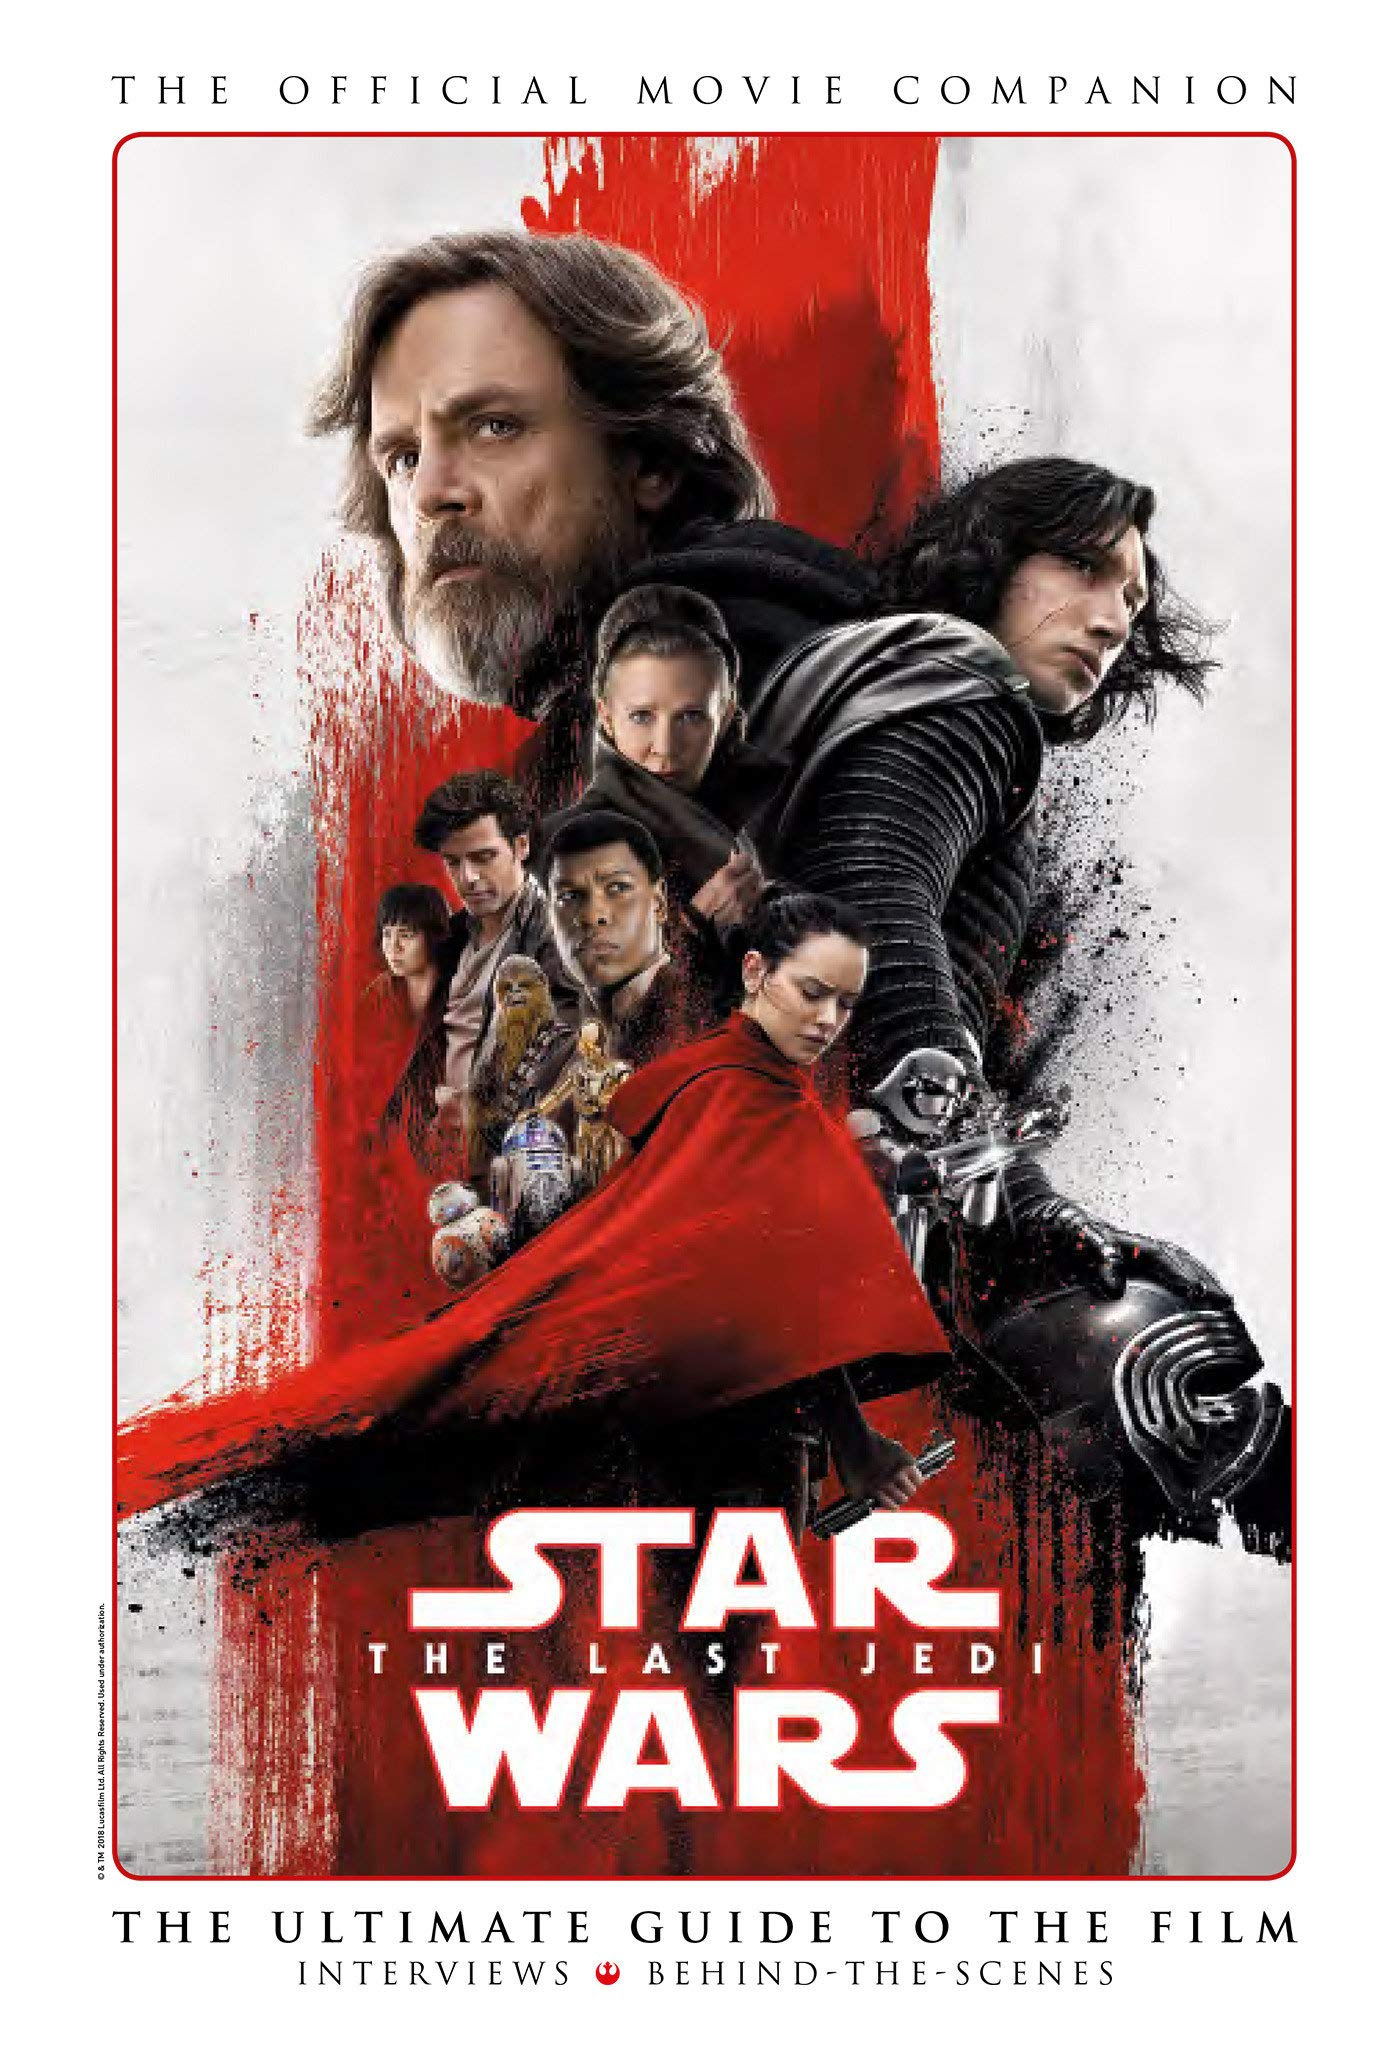 Star Wars The Last Jedi: The Official Debrief